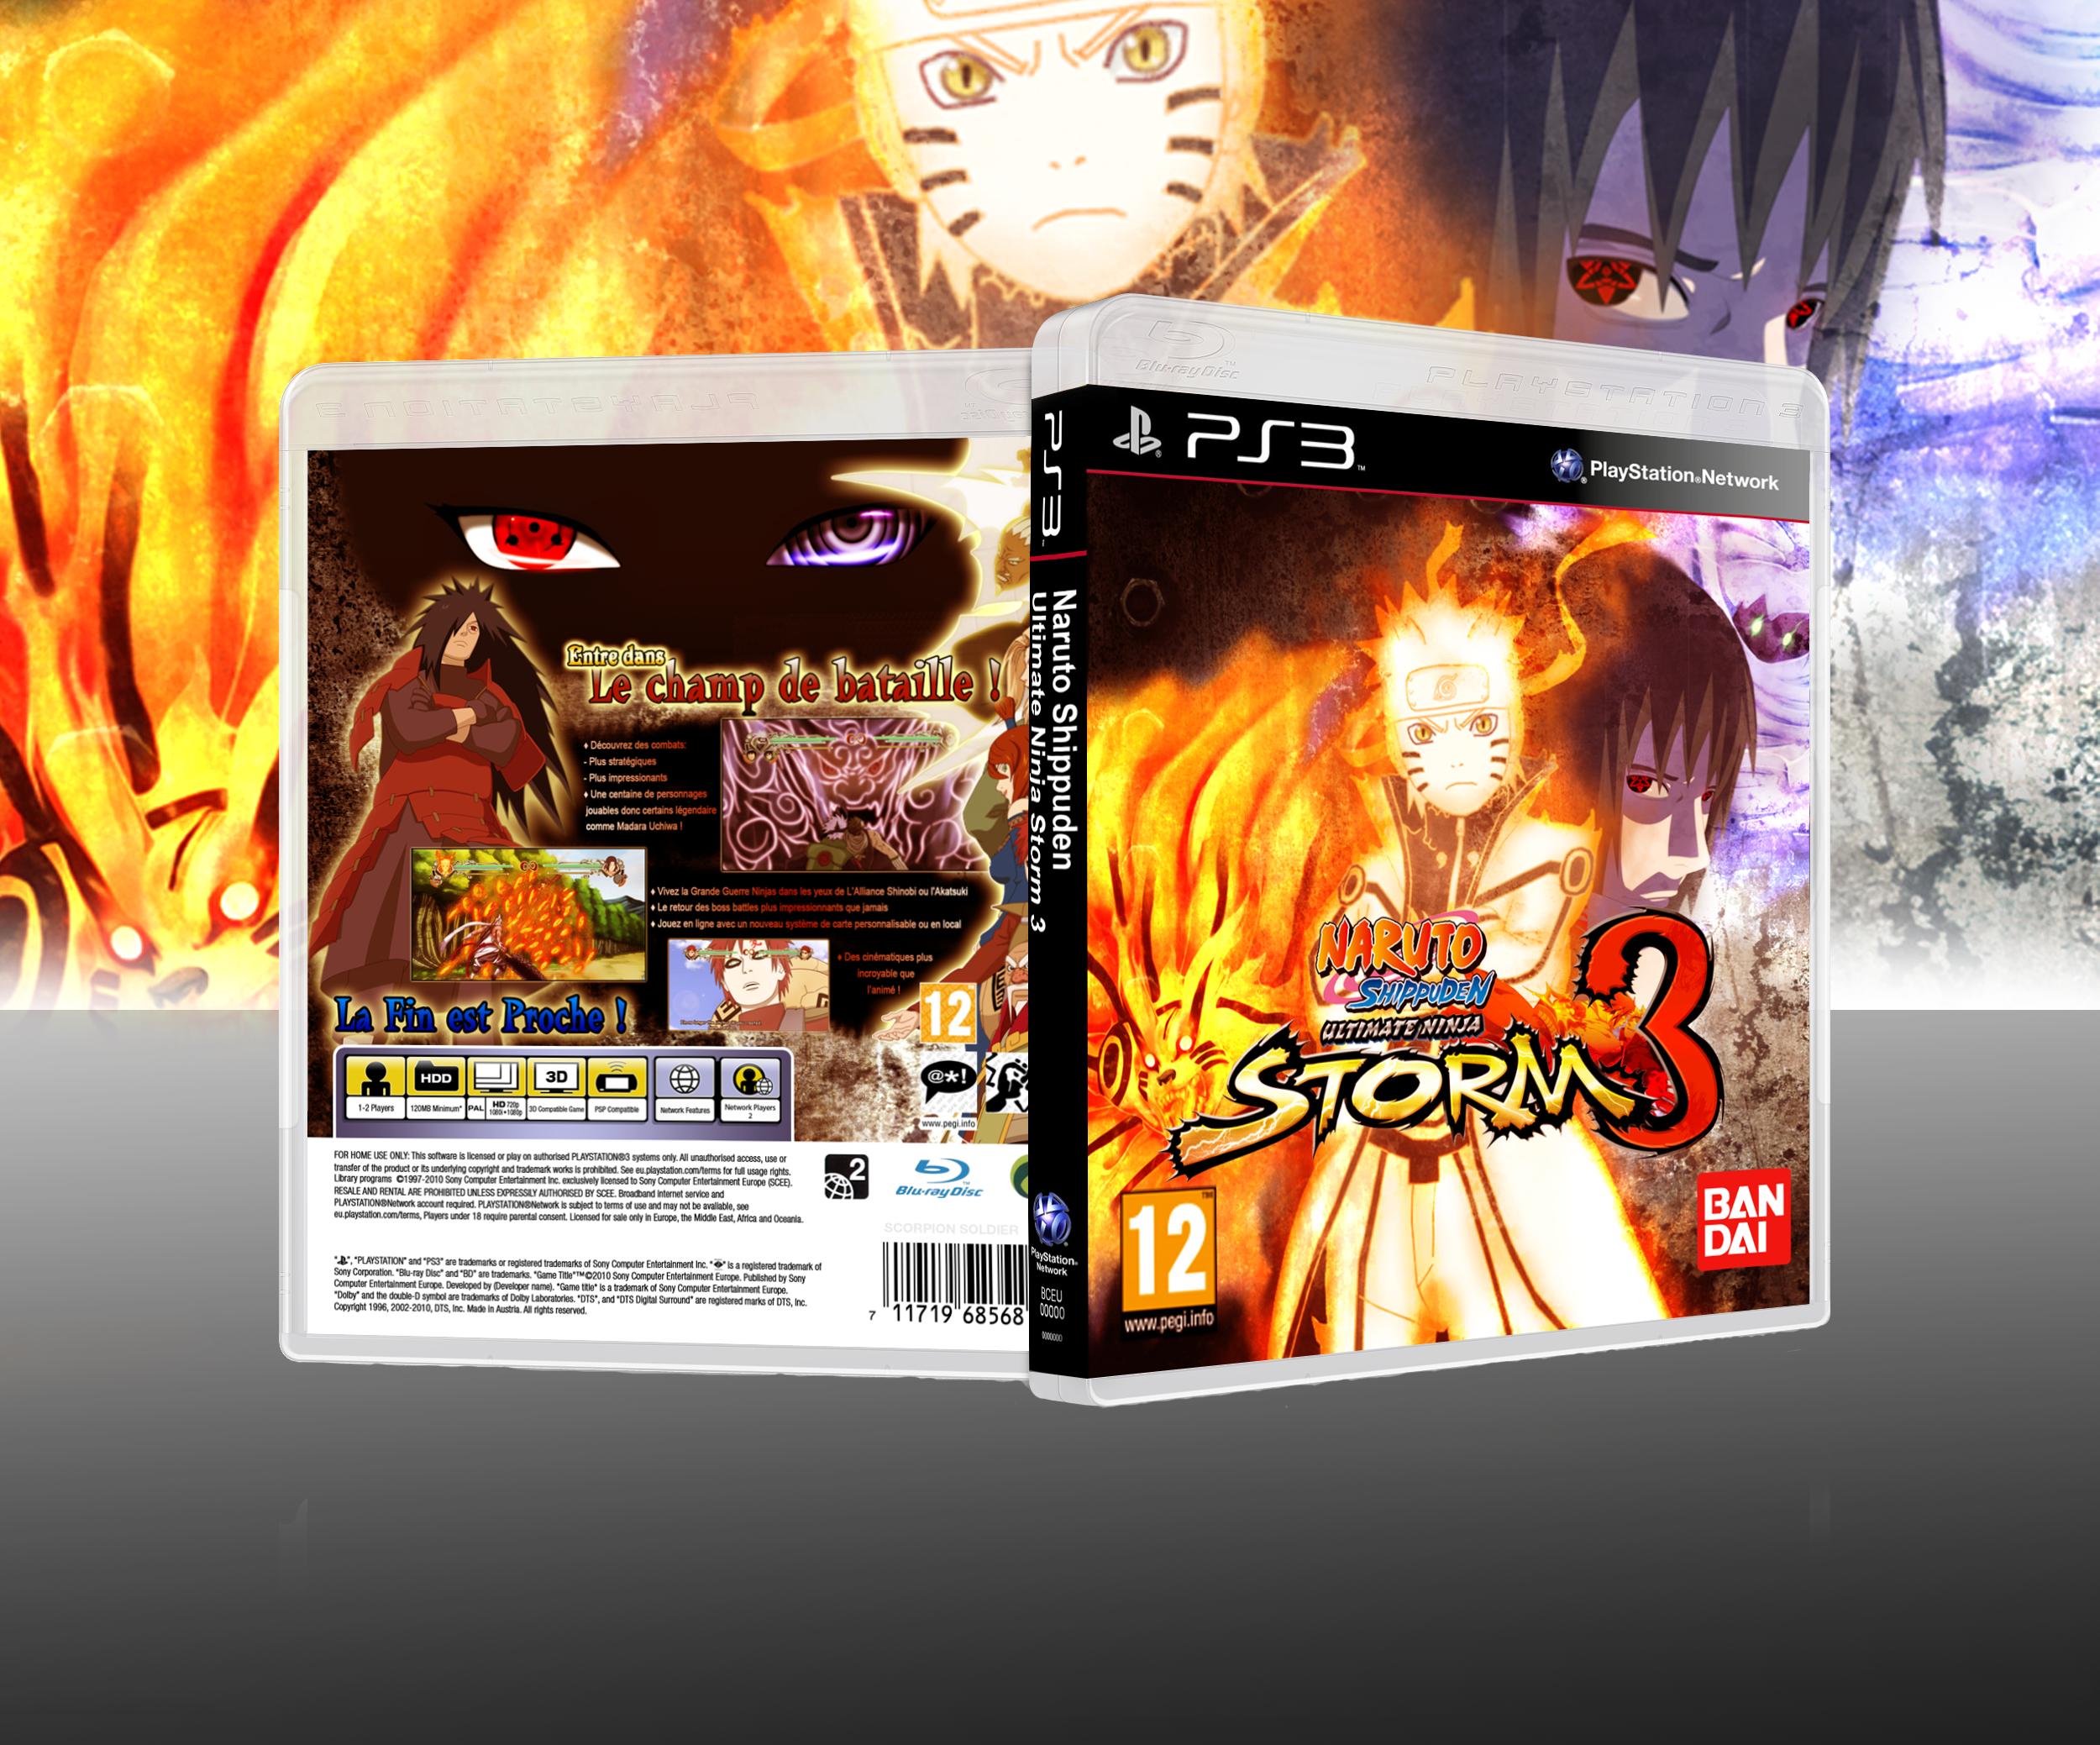 Re: Naruto Shippuden: Ultimate Ninja Storm 3